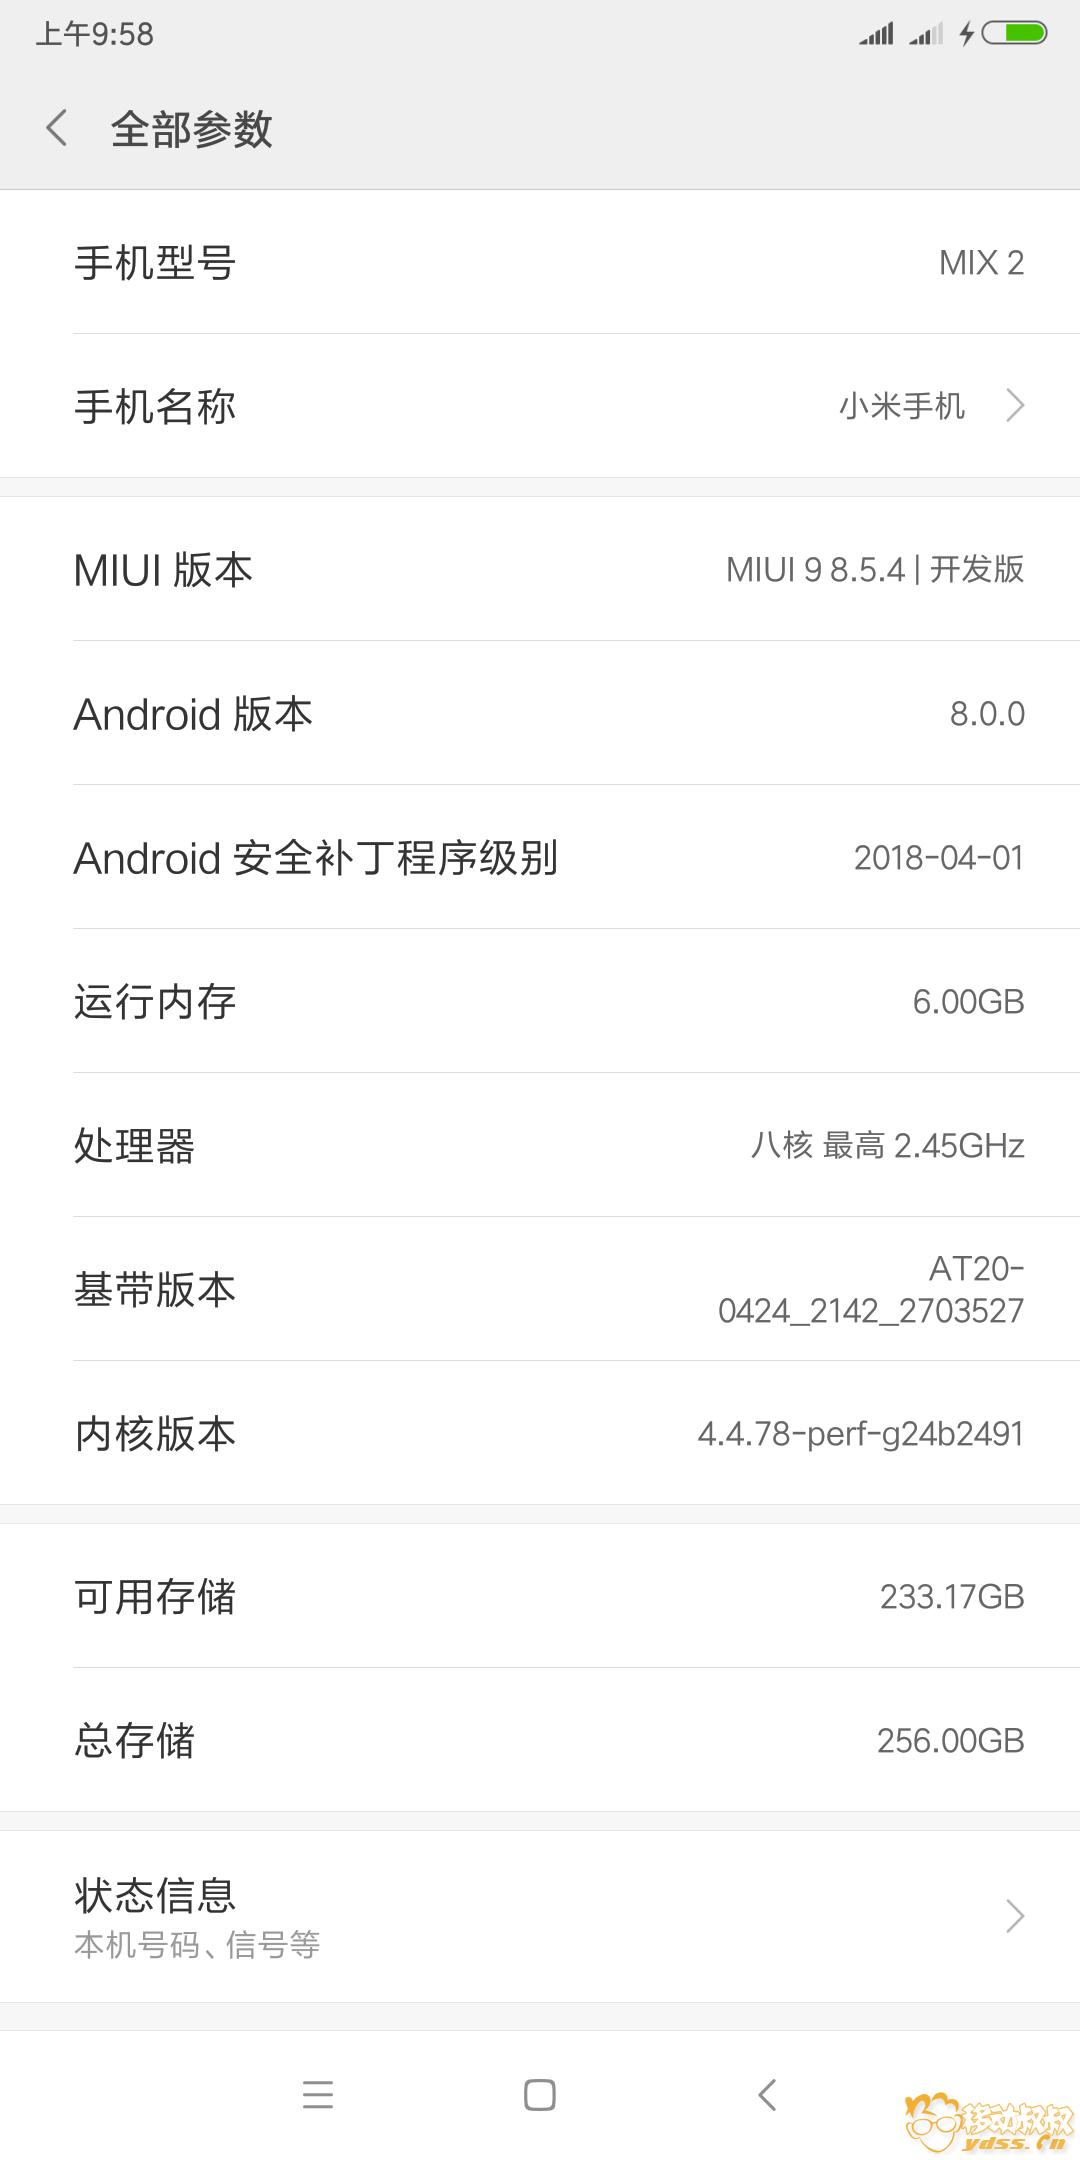 Screenshot_2018-05-05-09-58-11-155_com.android.settings.png